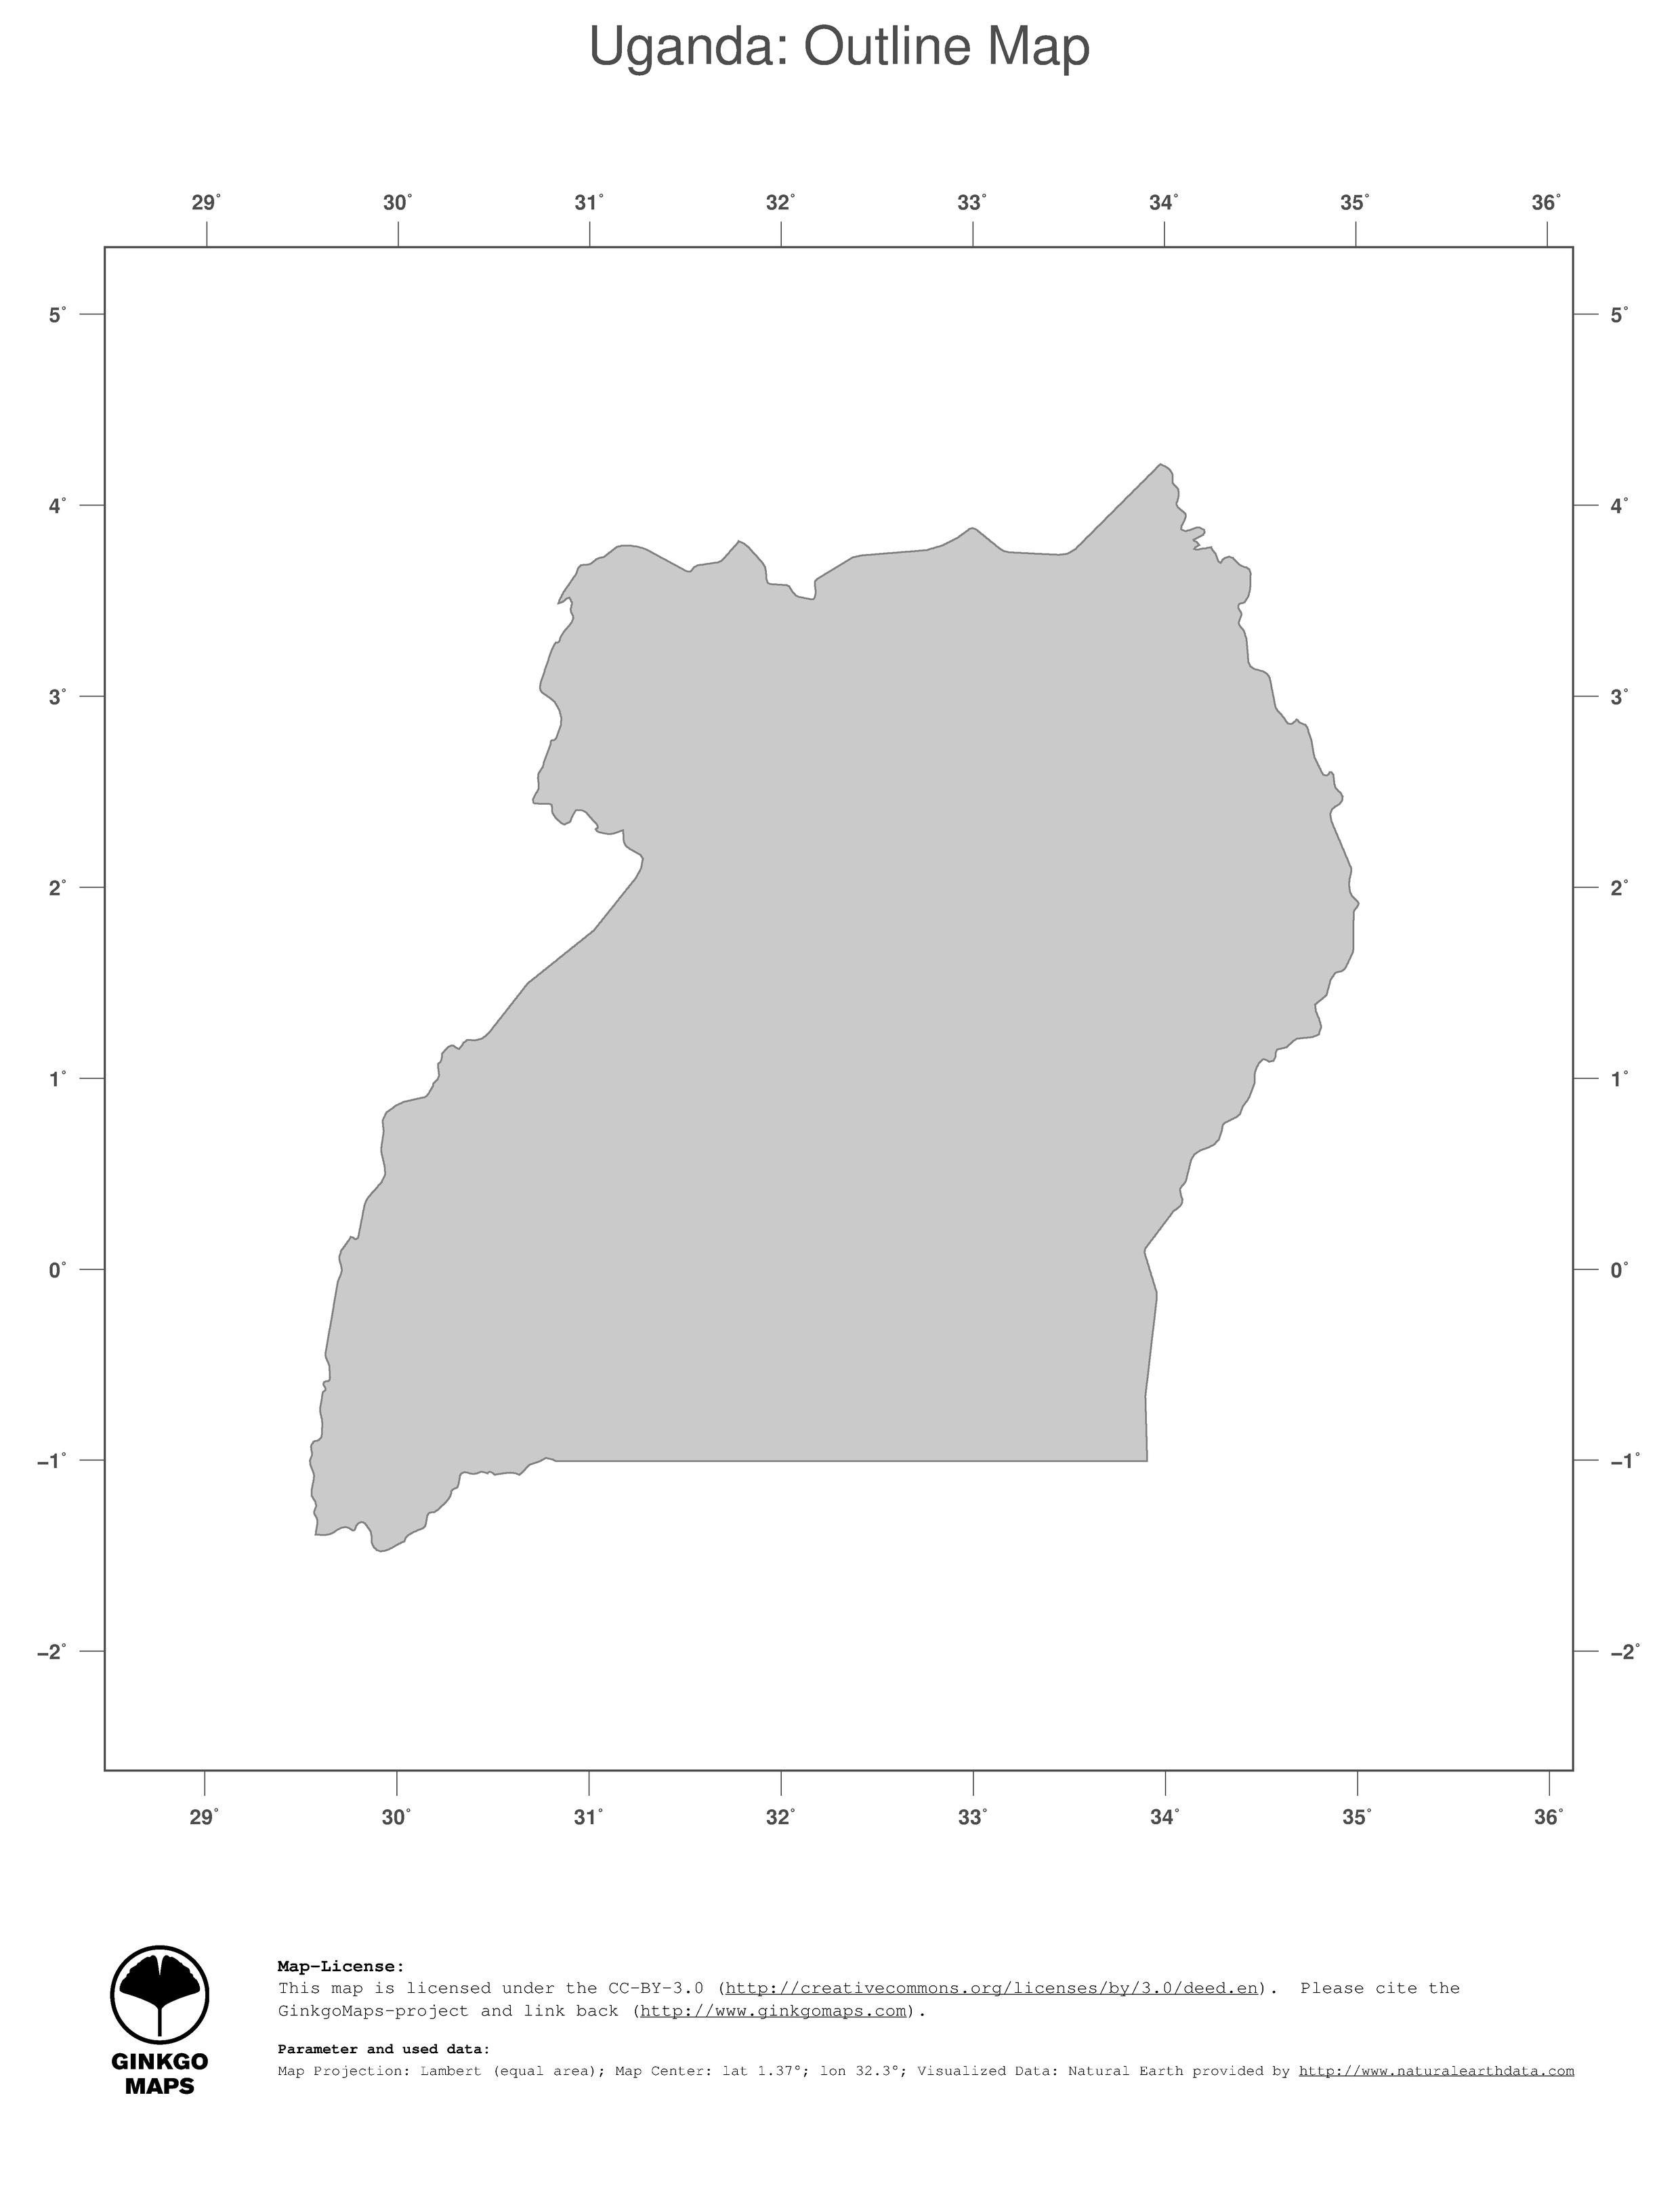 Map Uganda GinkgoMaps continent Africa region Uganda